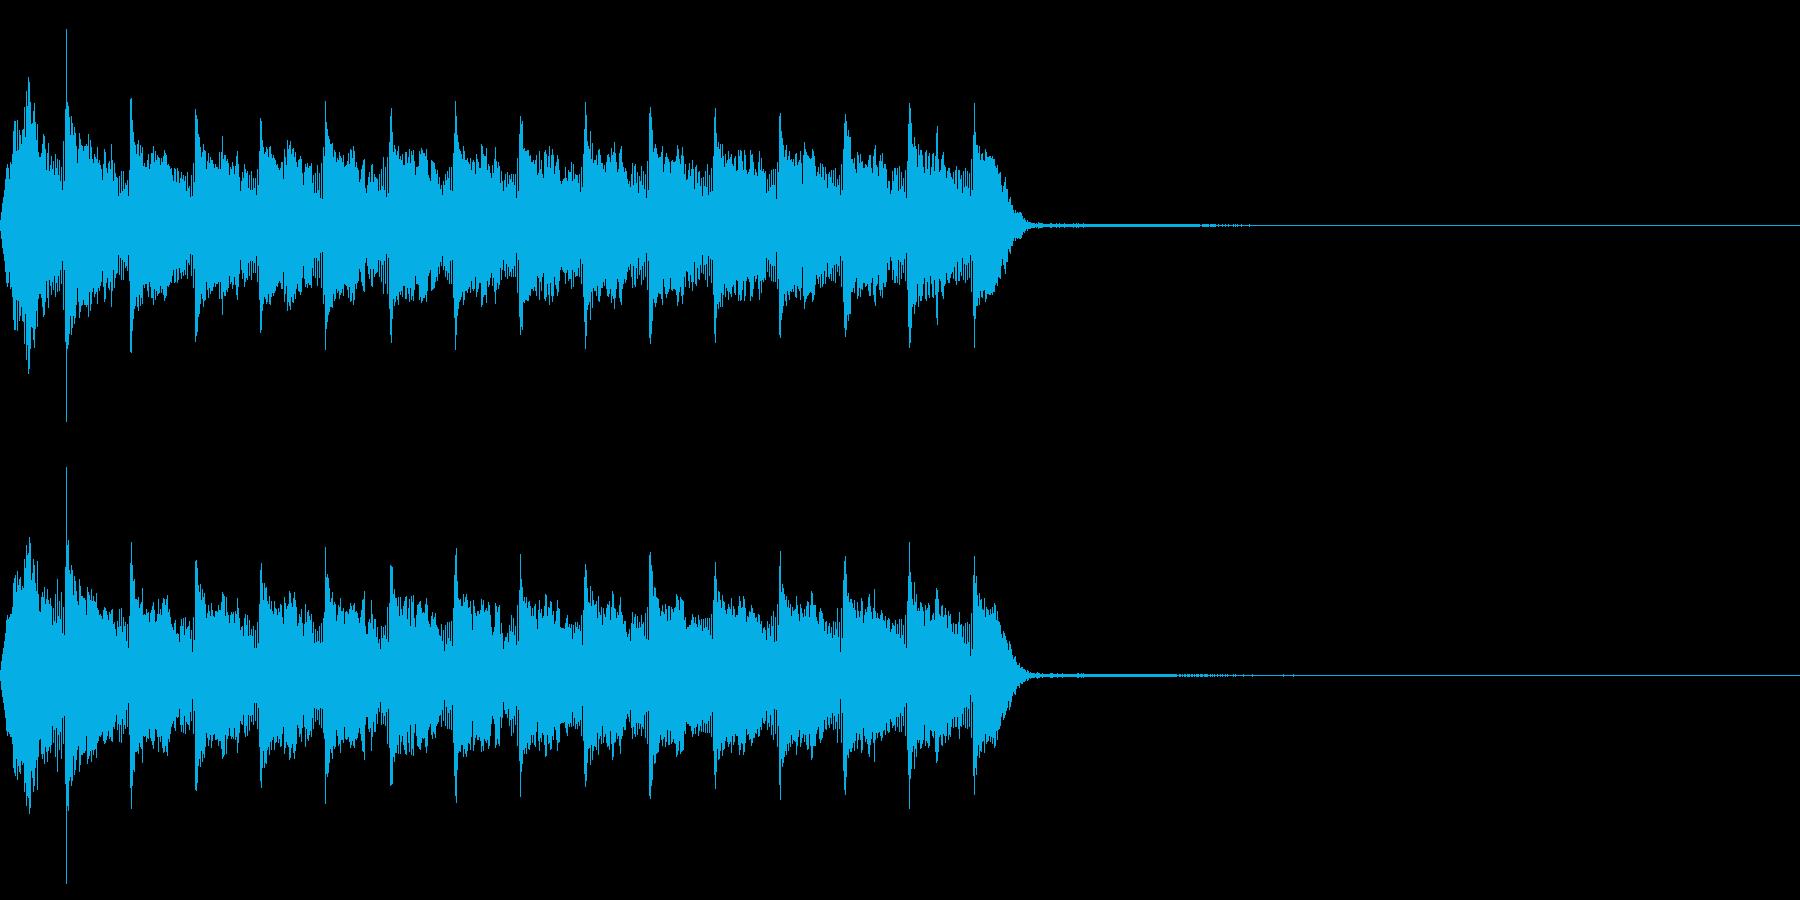 Razor レイザー小銃の連射音 2の再生済みの波形